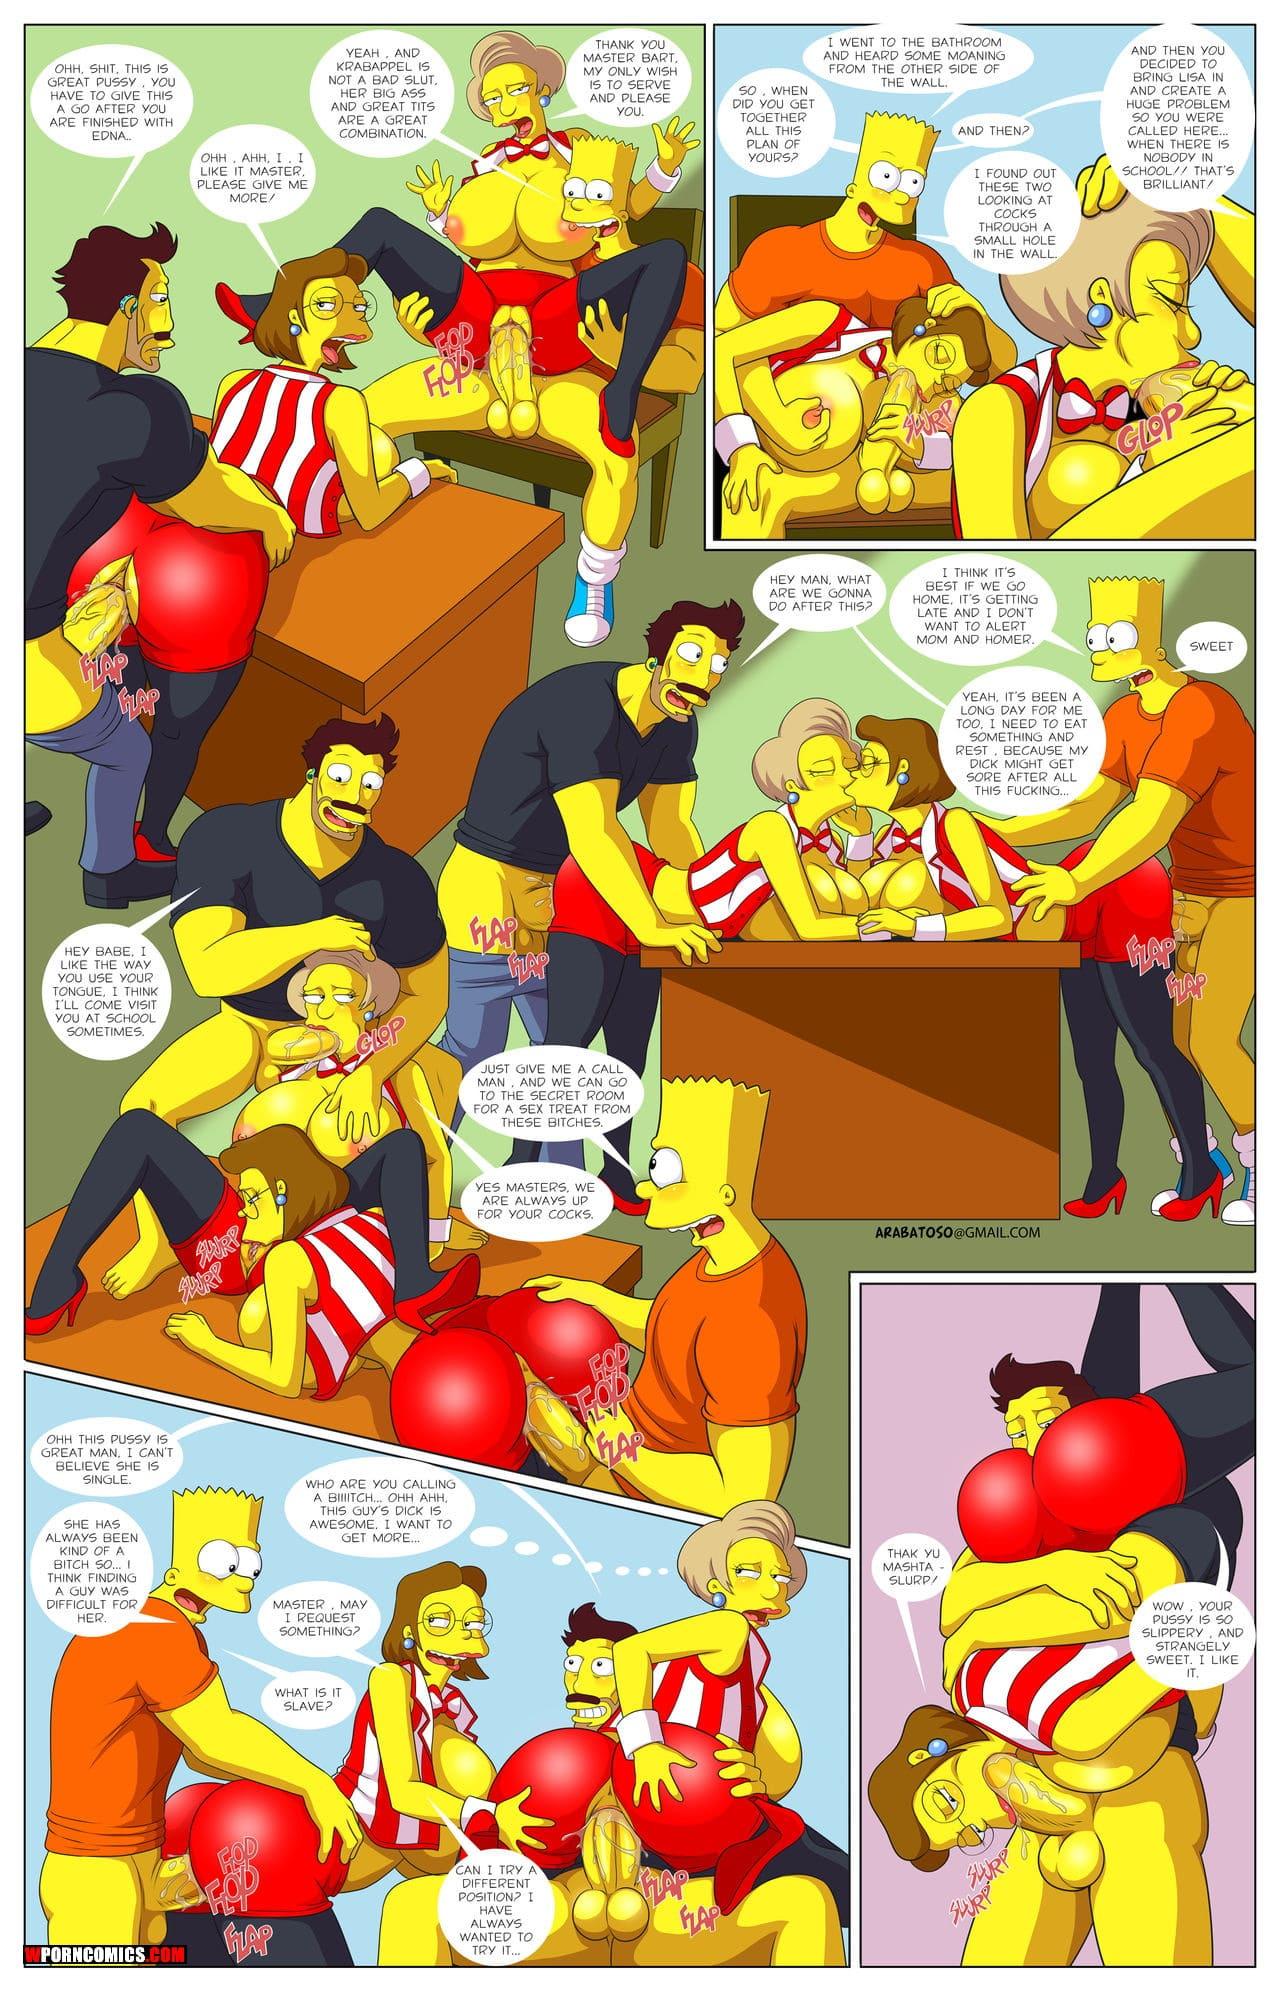 porn-comic-simpsons-darrens-adventure-part-3-2020-03-22/porn-comic-simpsons-darrens-adventure-part-3-2020-03-22-33242.jpg